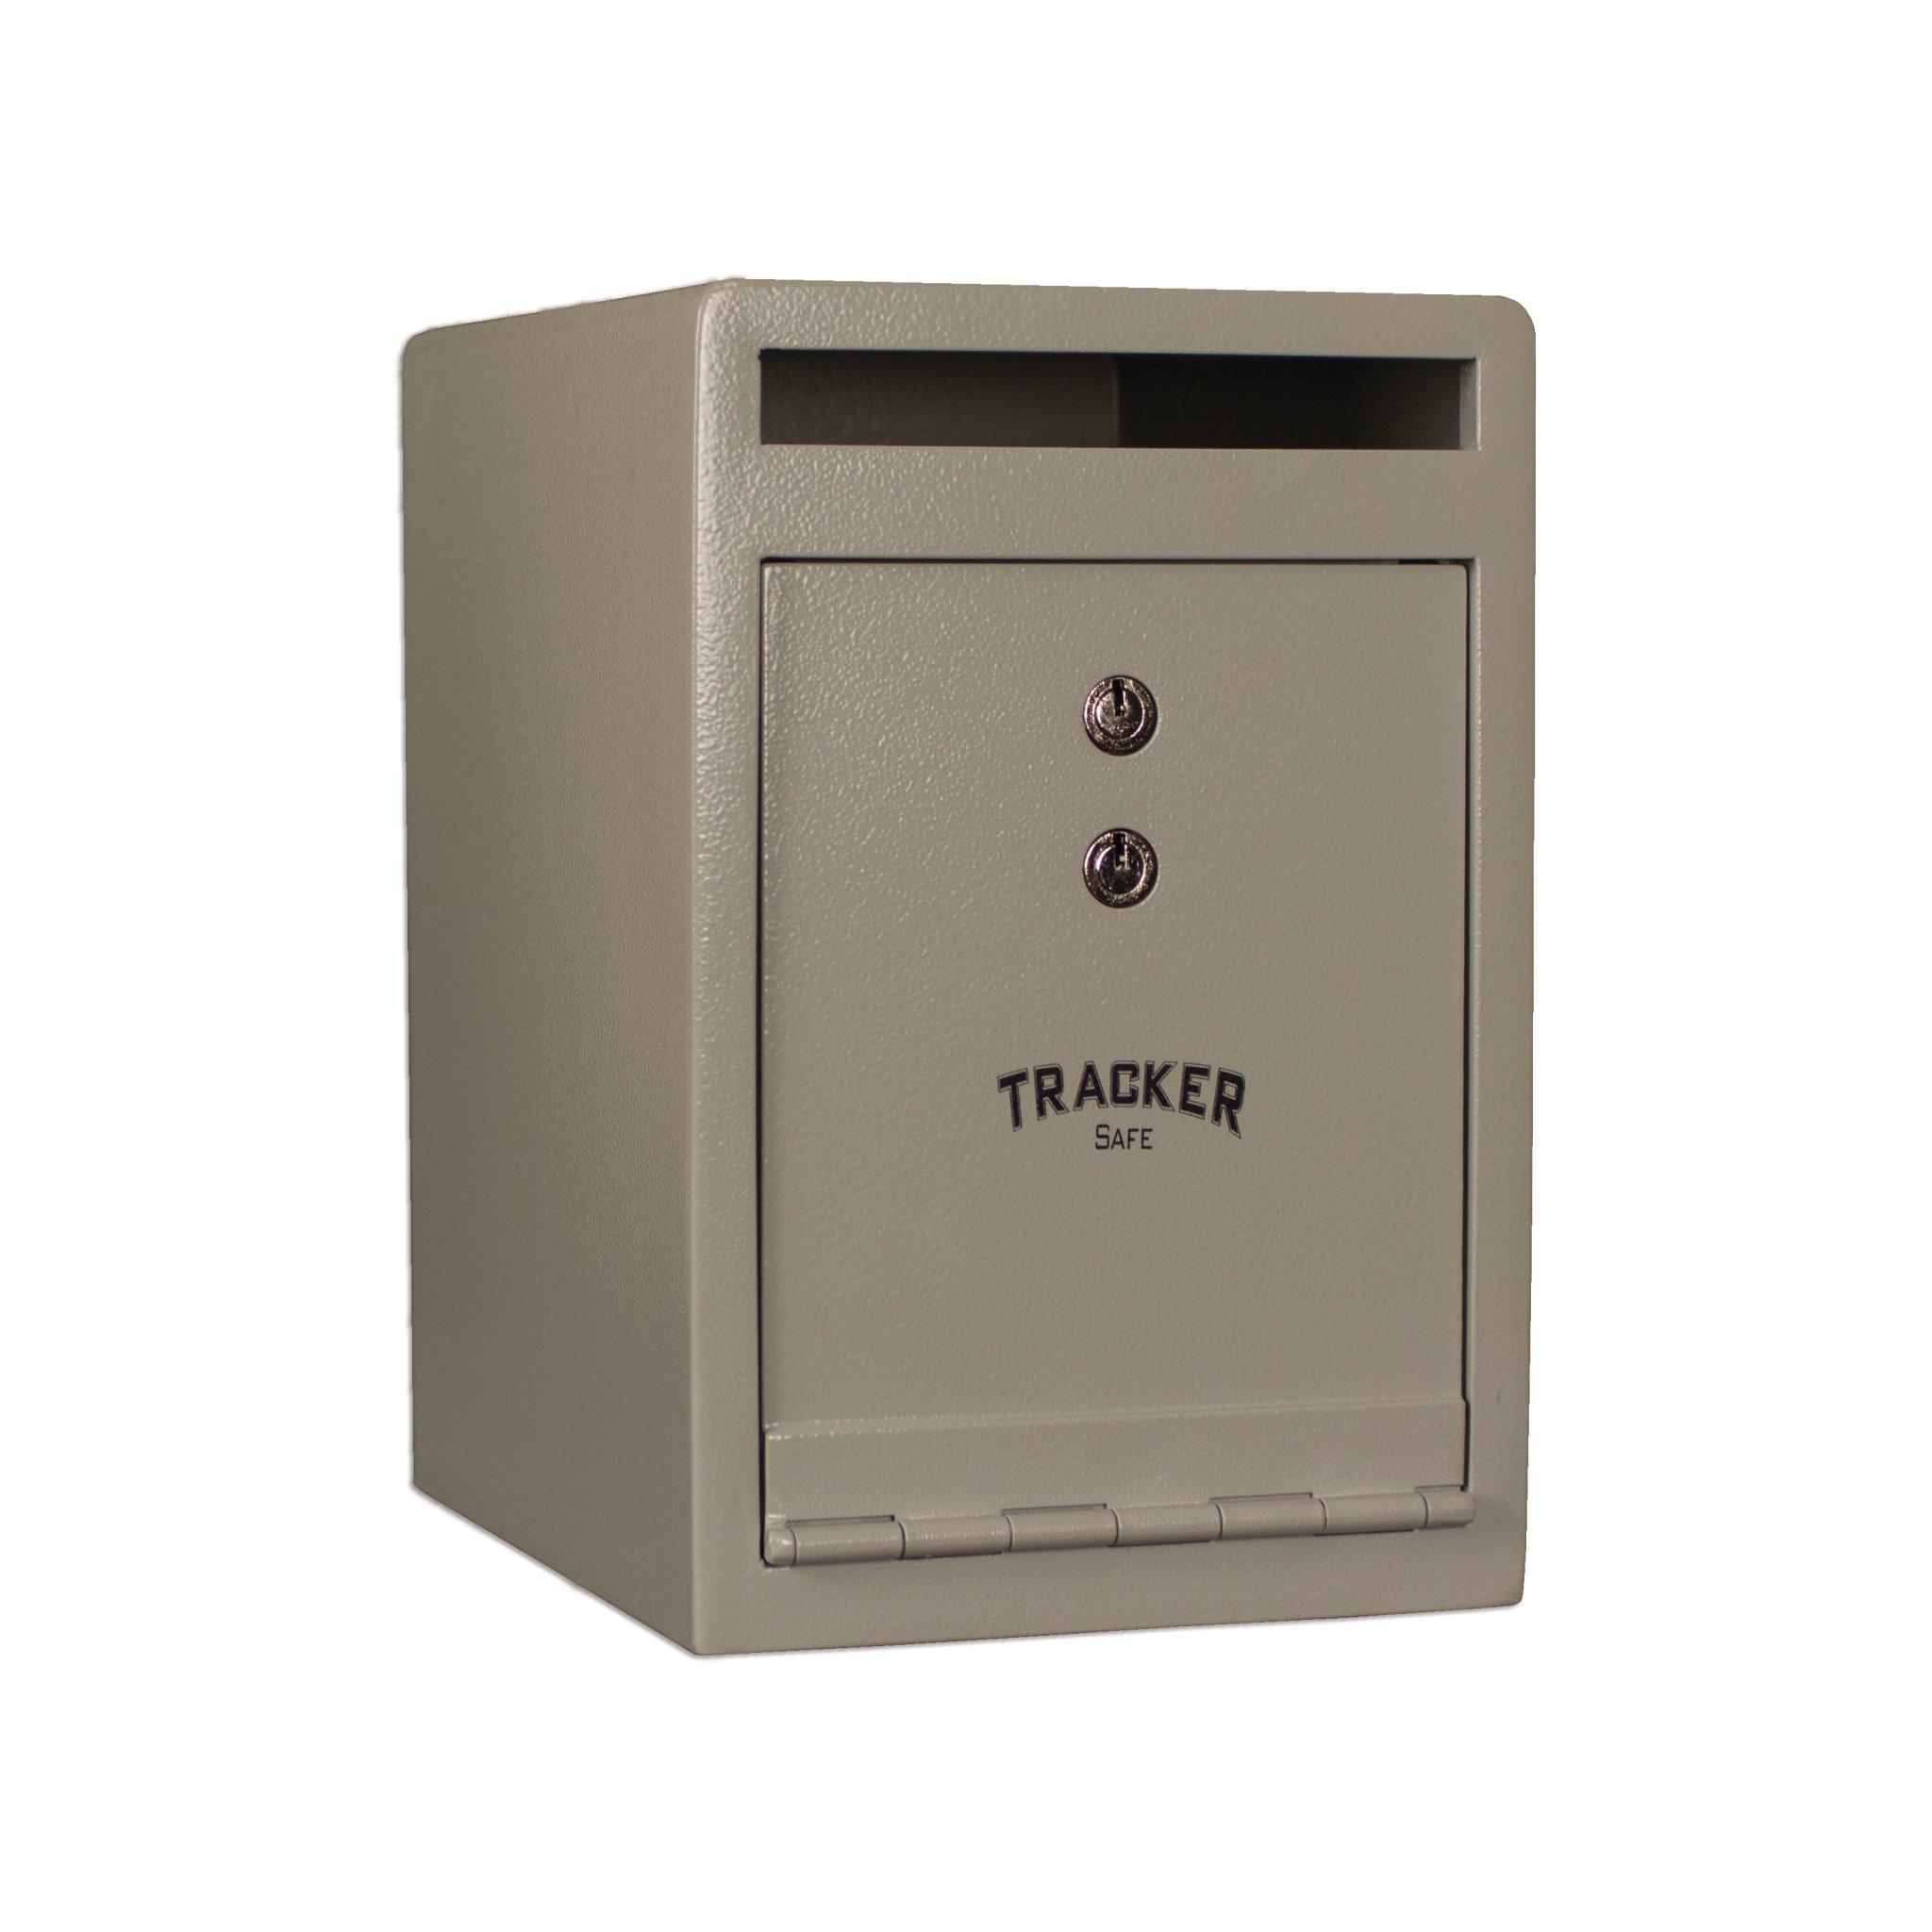 Tracker Safe DS120810-K Steel Deposit Safe, Key Lock, White/Cream Powder Coat Paint, 0.55 cu. ft.